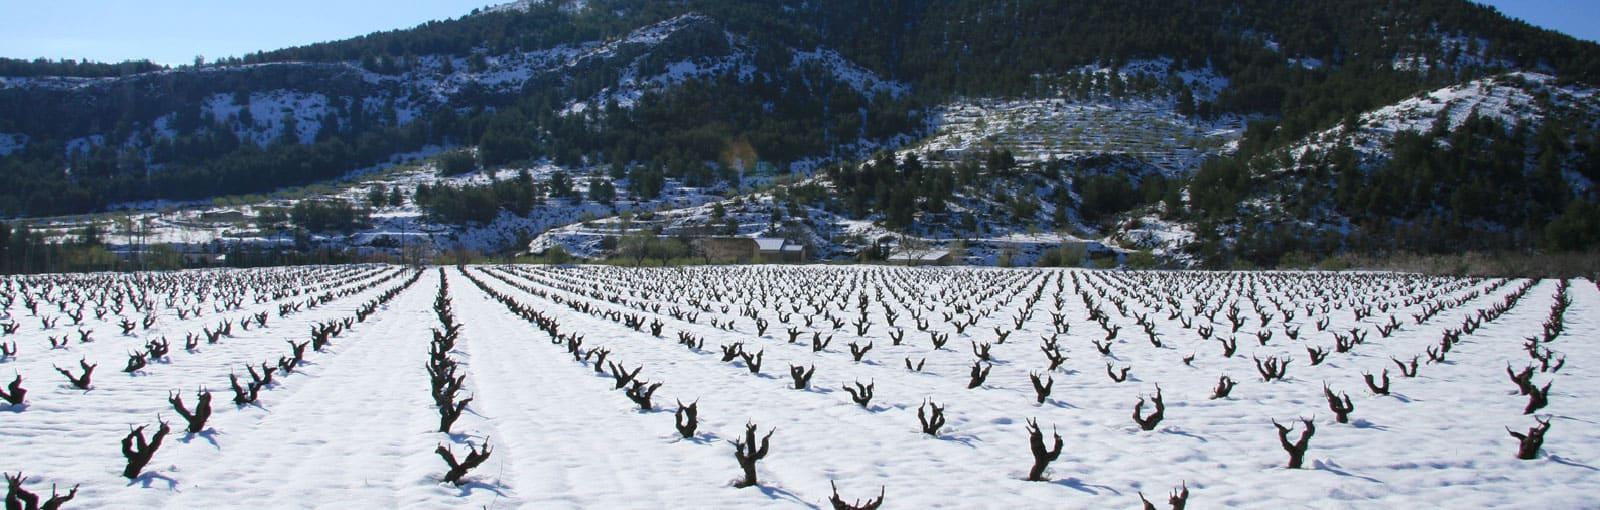 Vineyard in Bullas, Spain with a covering of snowfall.